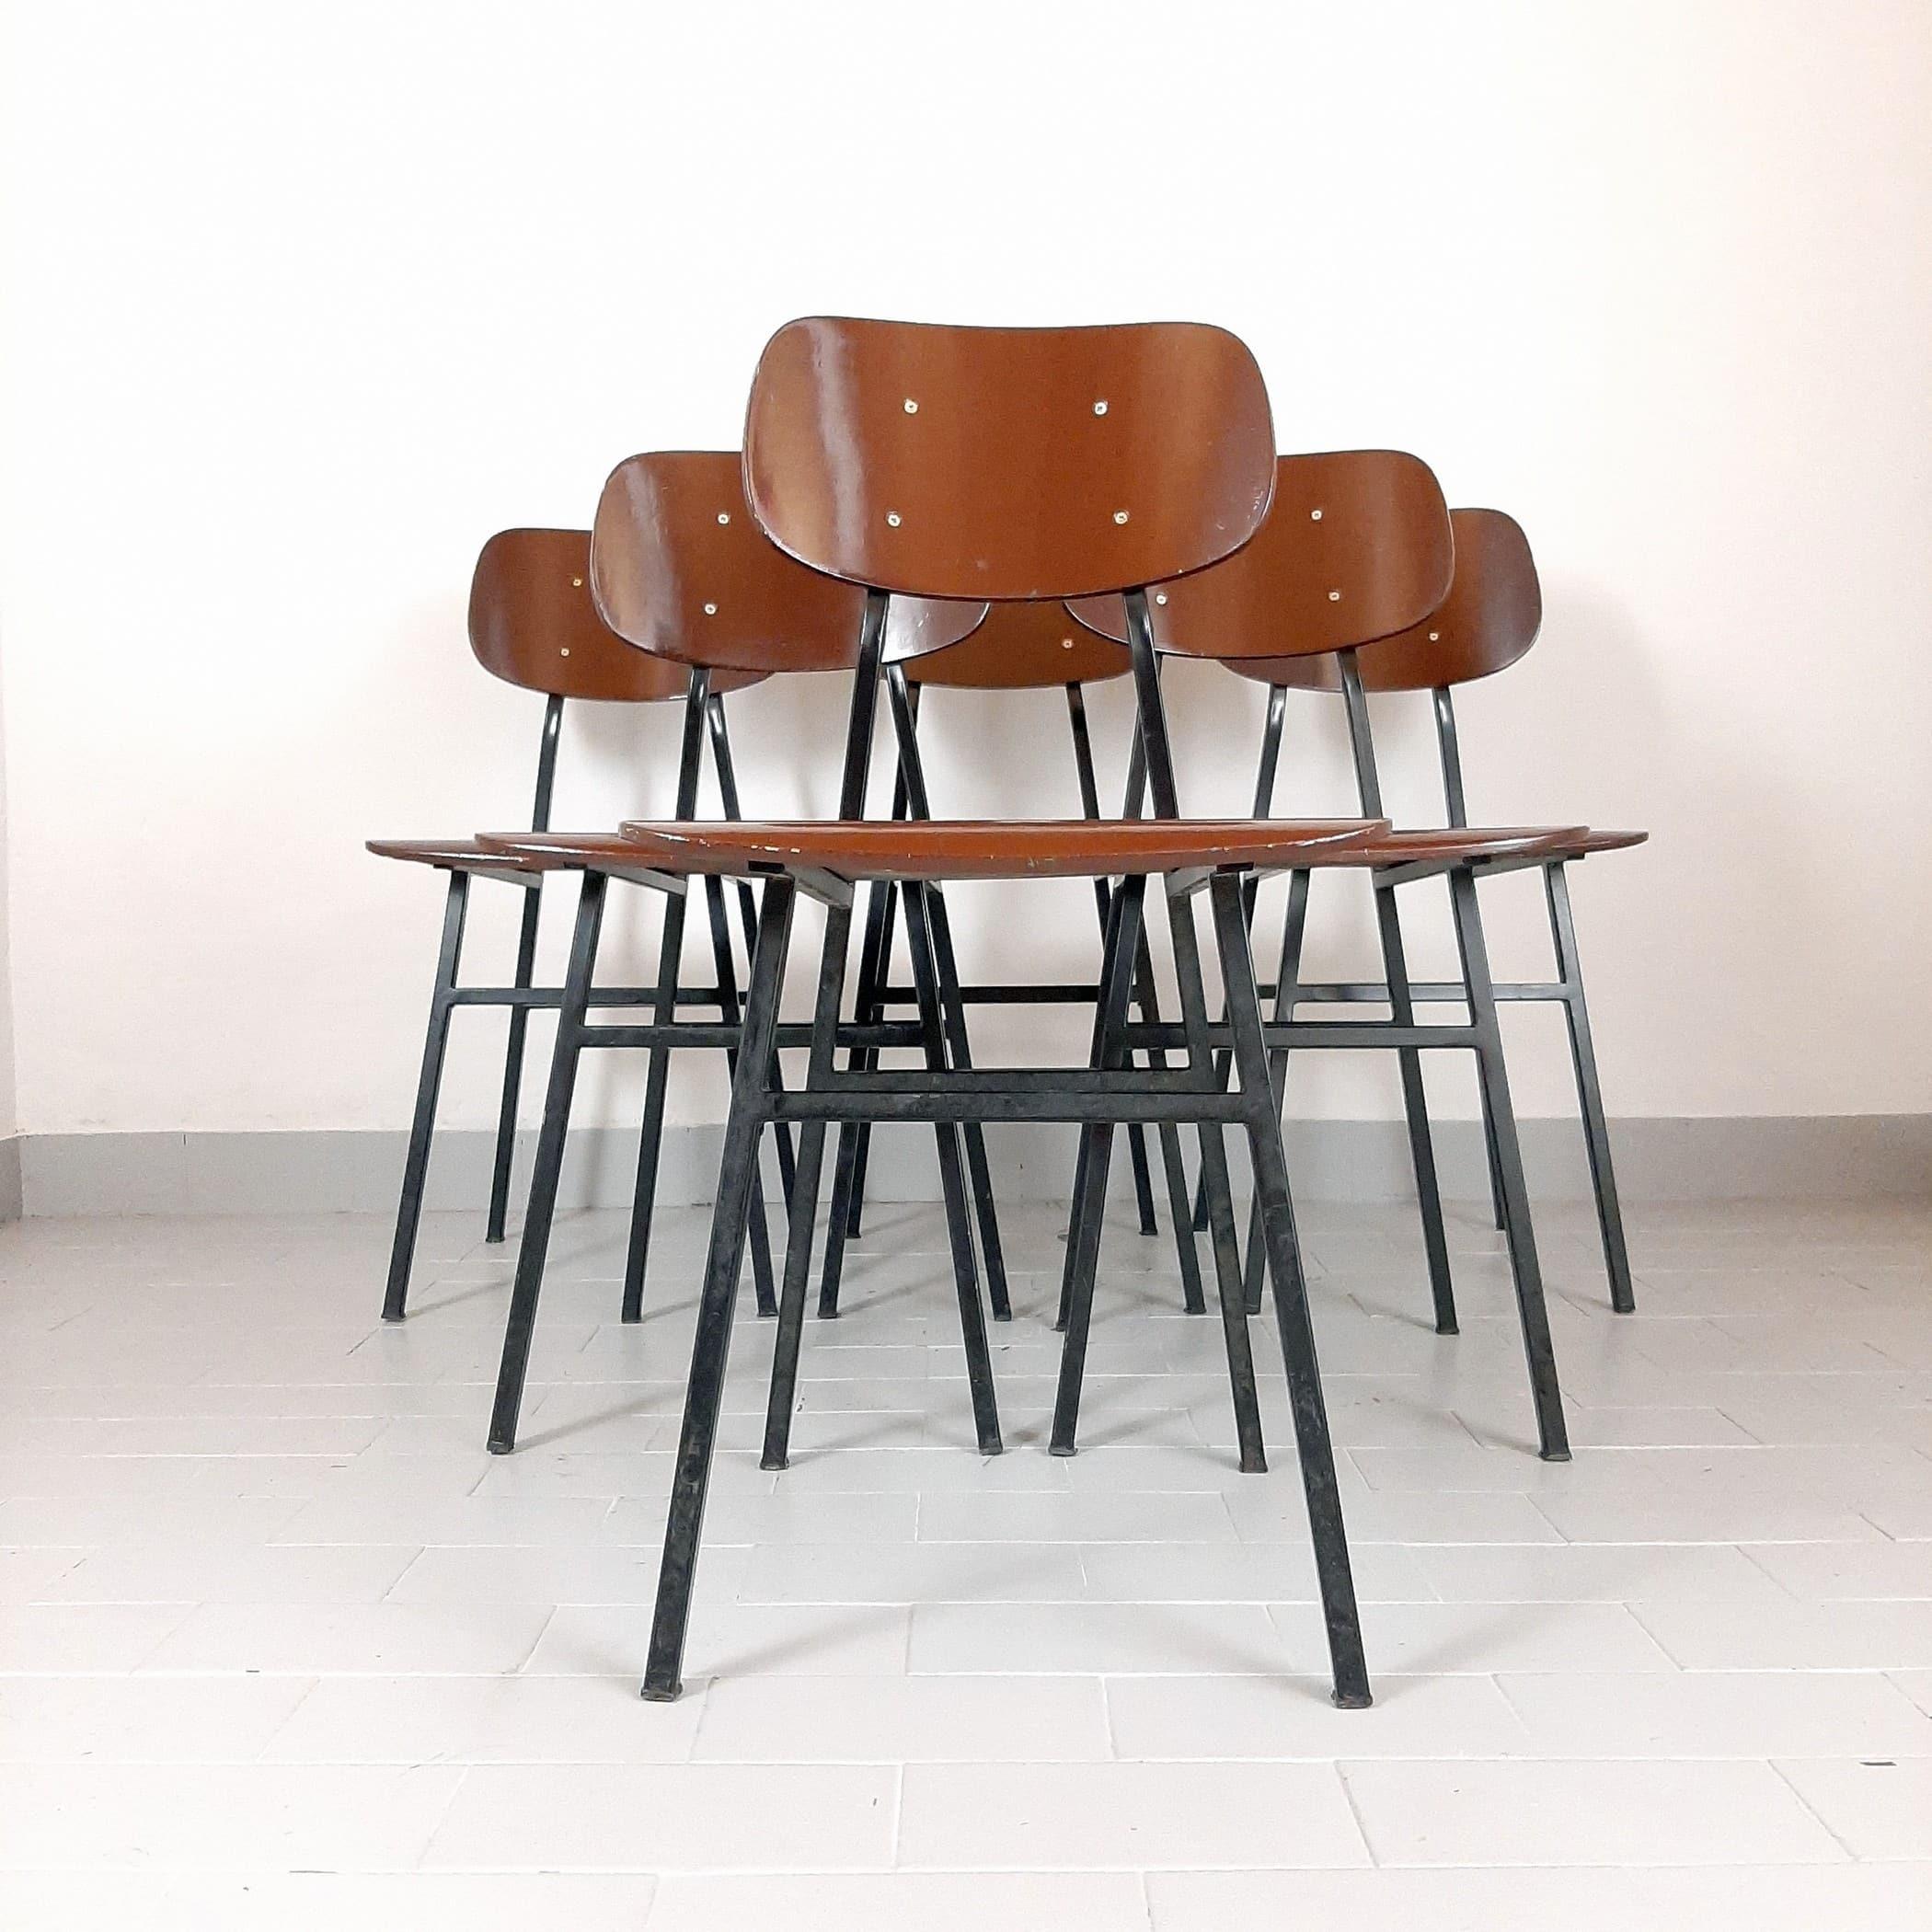 1 of 24 Retro office school chair from Niko Kralj for Stol Kamnik 1960s Home office Mid-century desk chair Brown chair